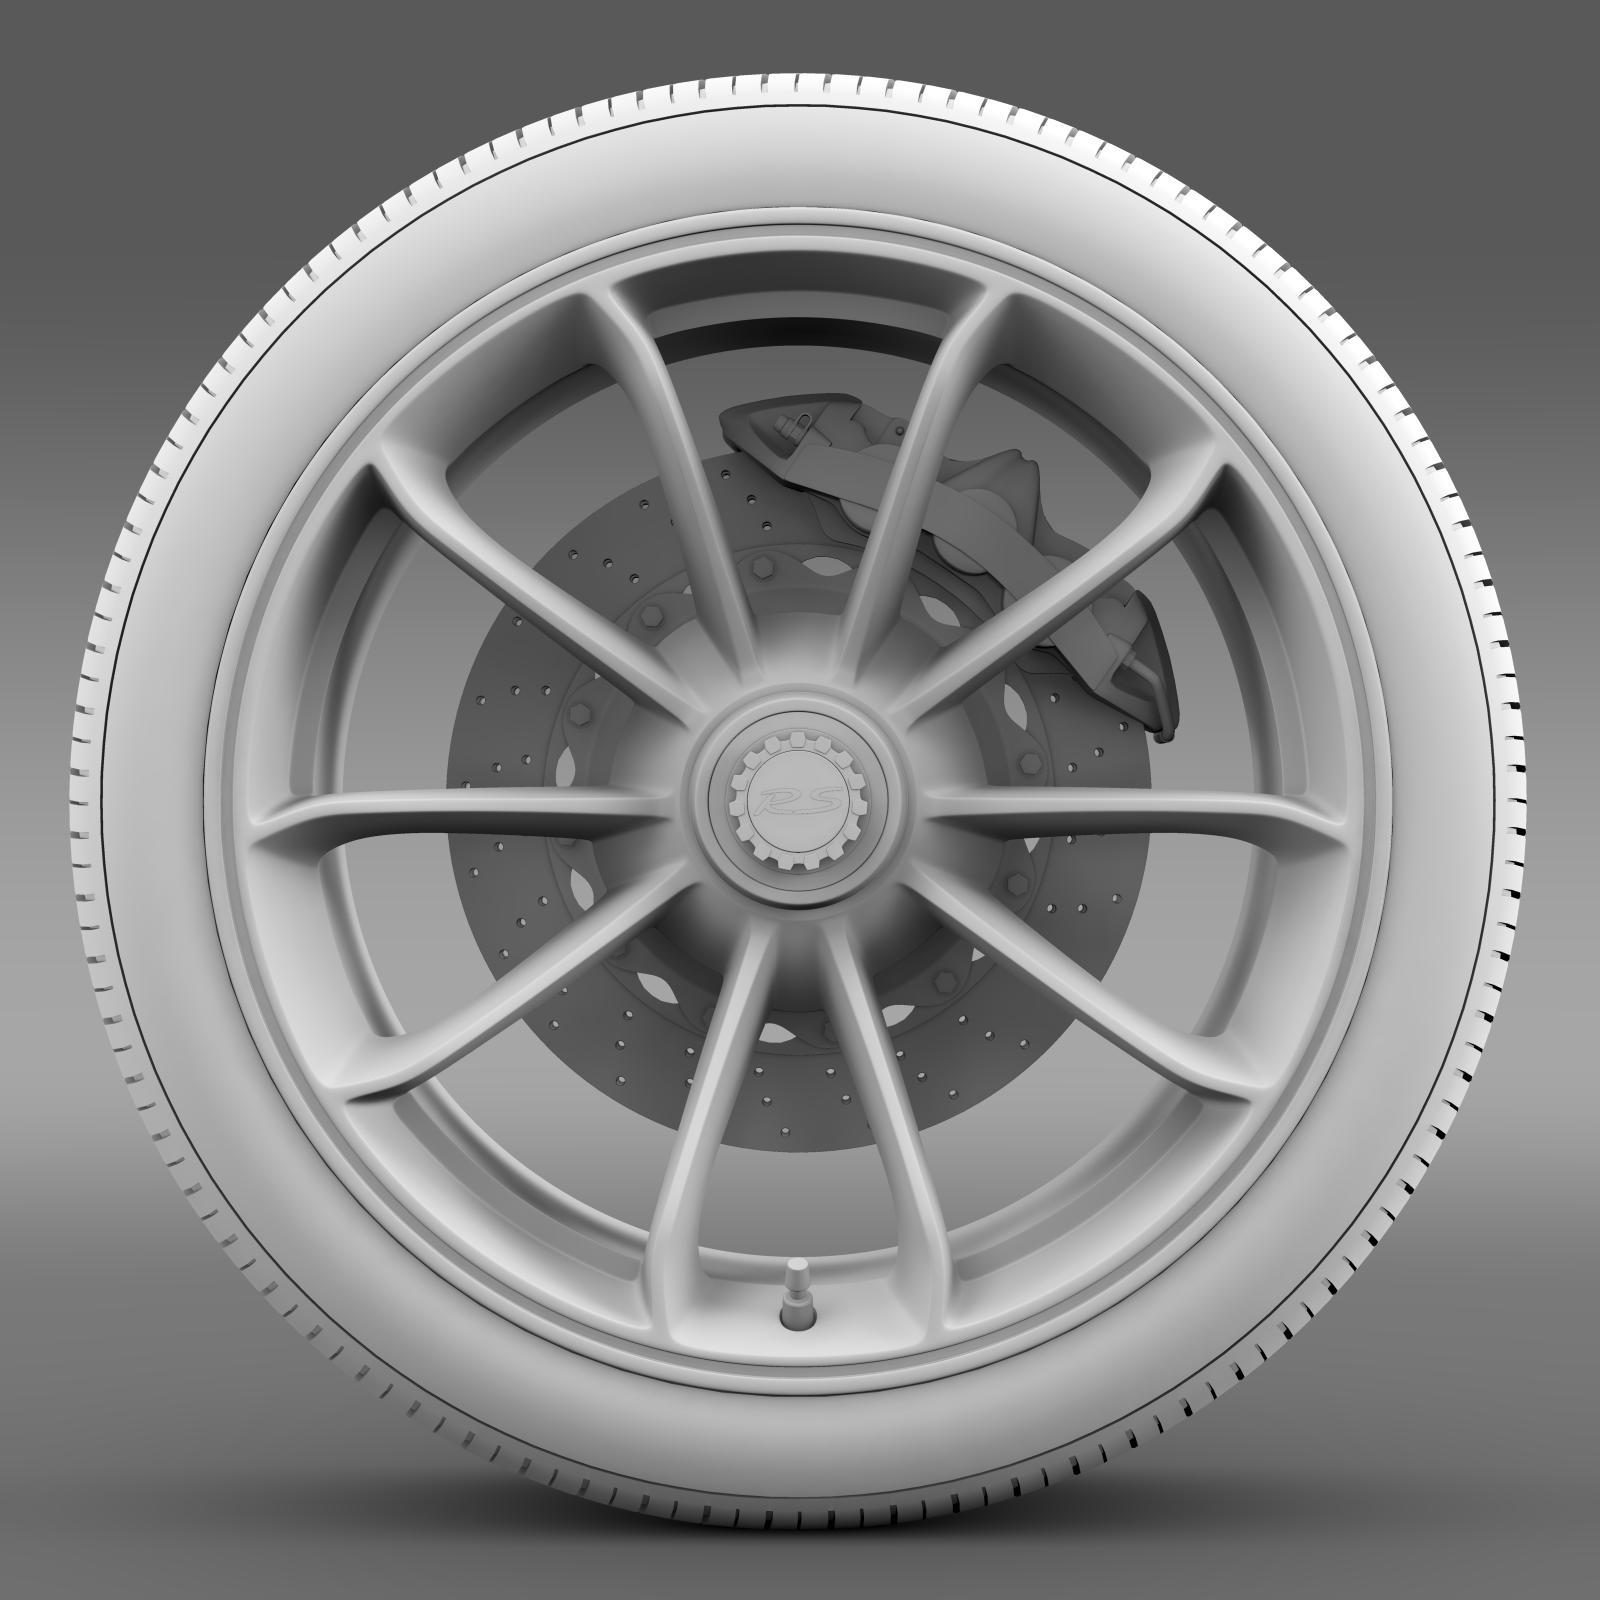 porsche 911 gt3 rs 2015 wheel 3d model 3ds max fbx c4d lwo ma mb hrc xsi obj 210834